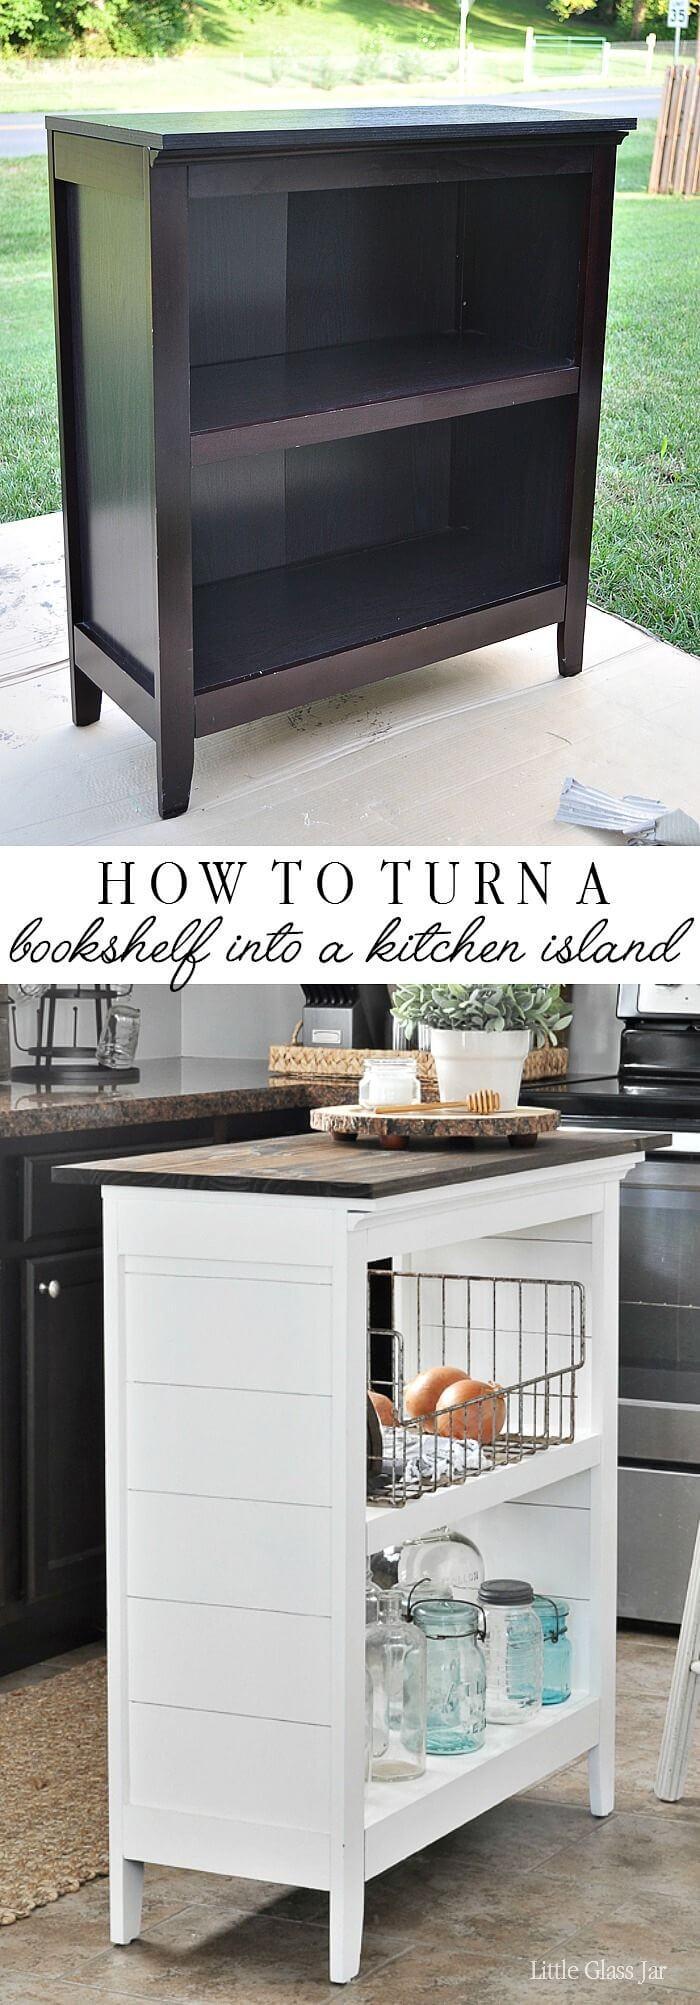 23 Best Diy Kitchen Island Ideas And Designs For 2020